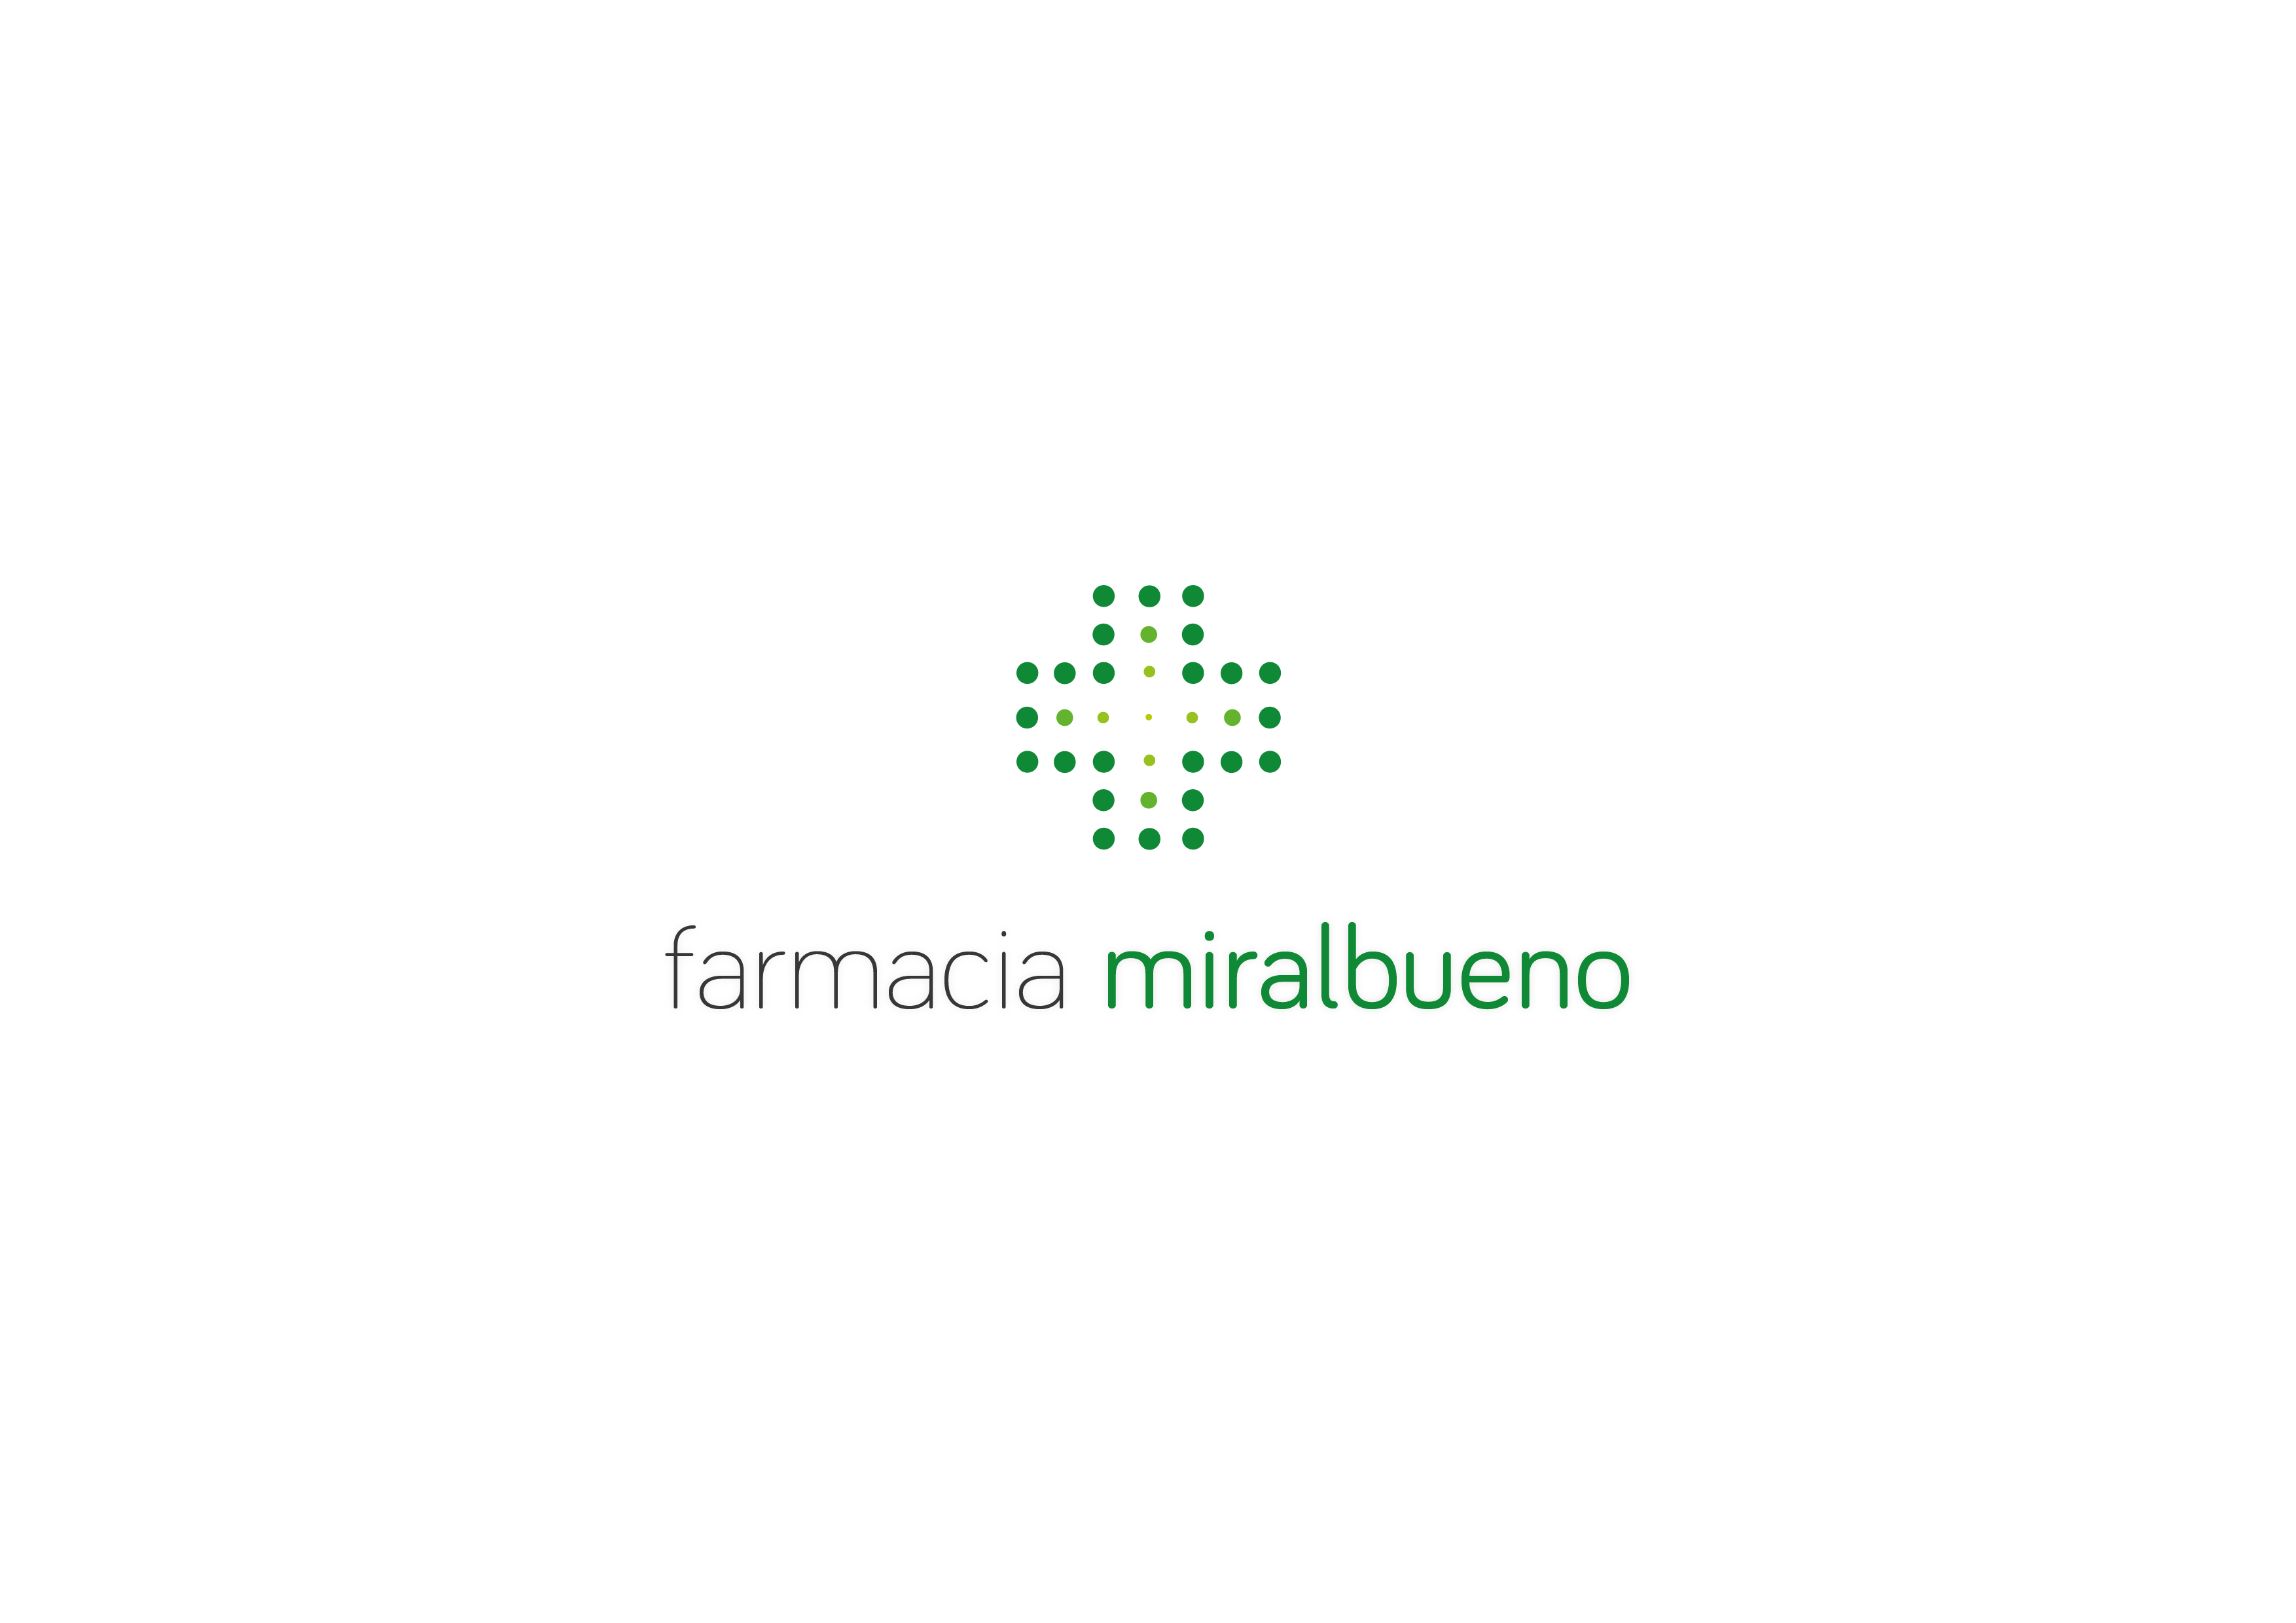 Farmacia Miralbueno